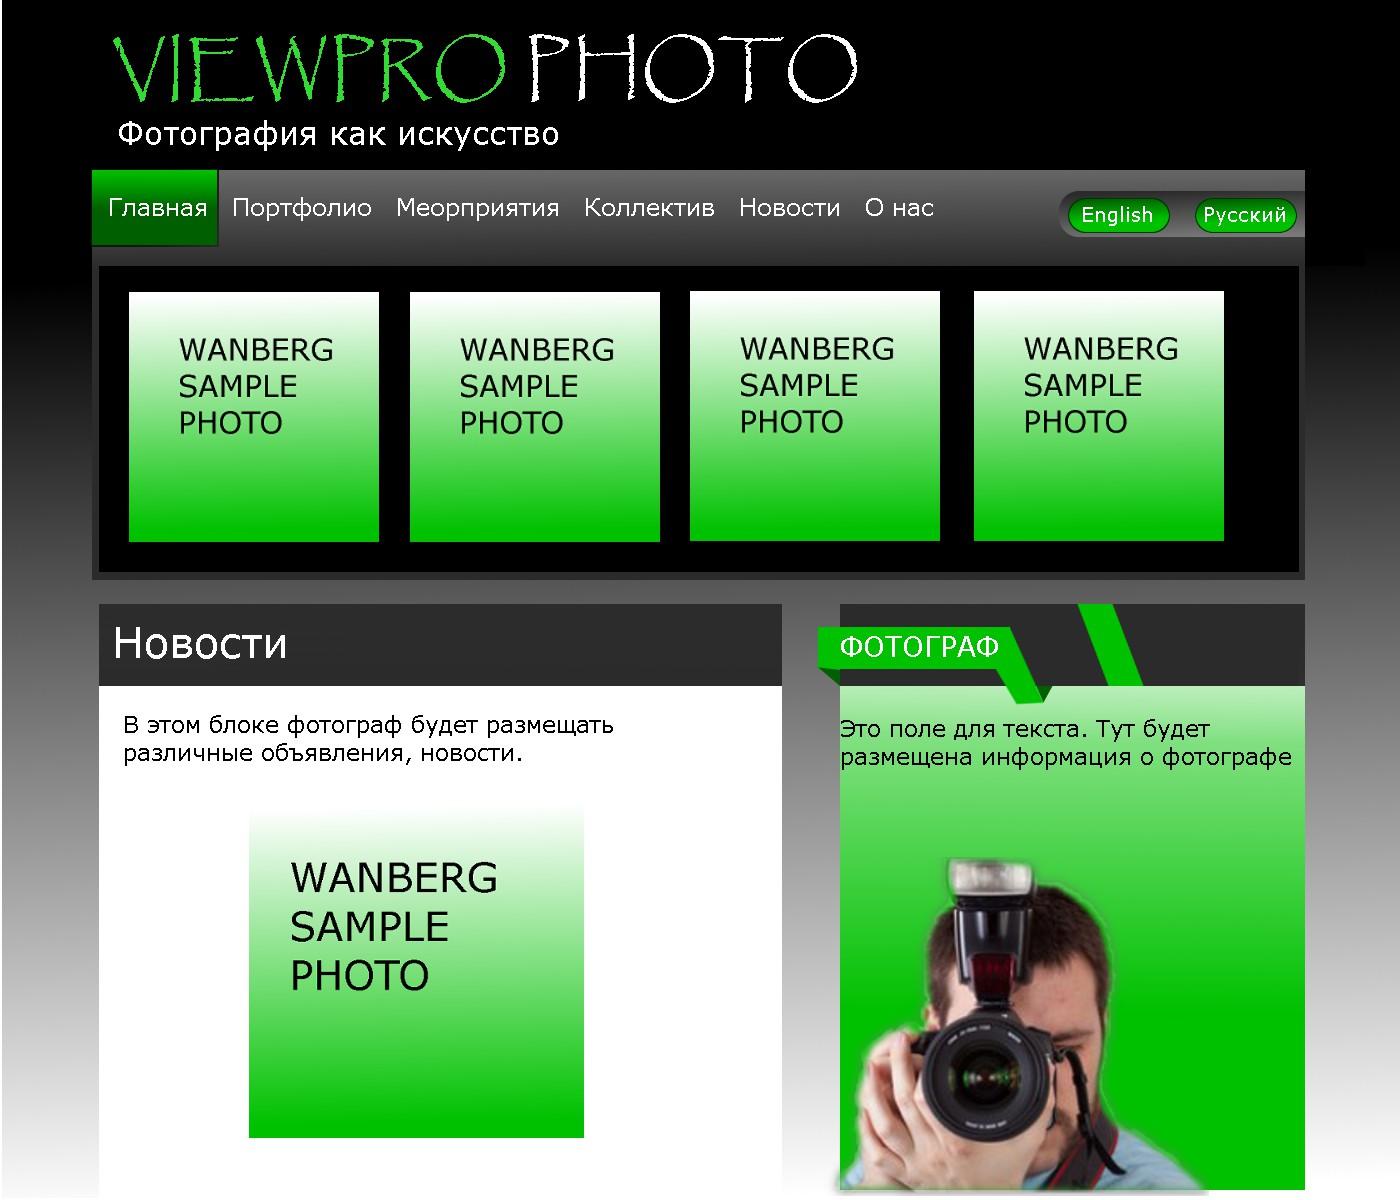 сыр сайт визитка для фотографа про